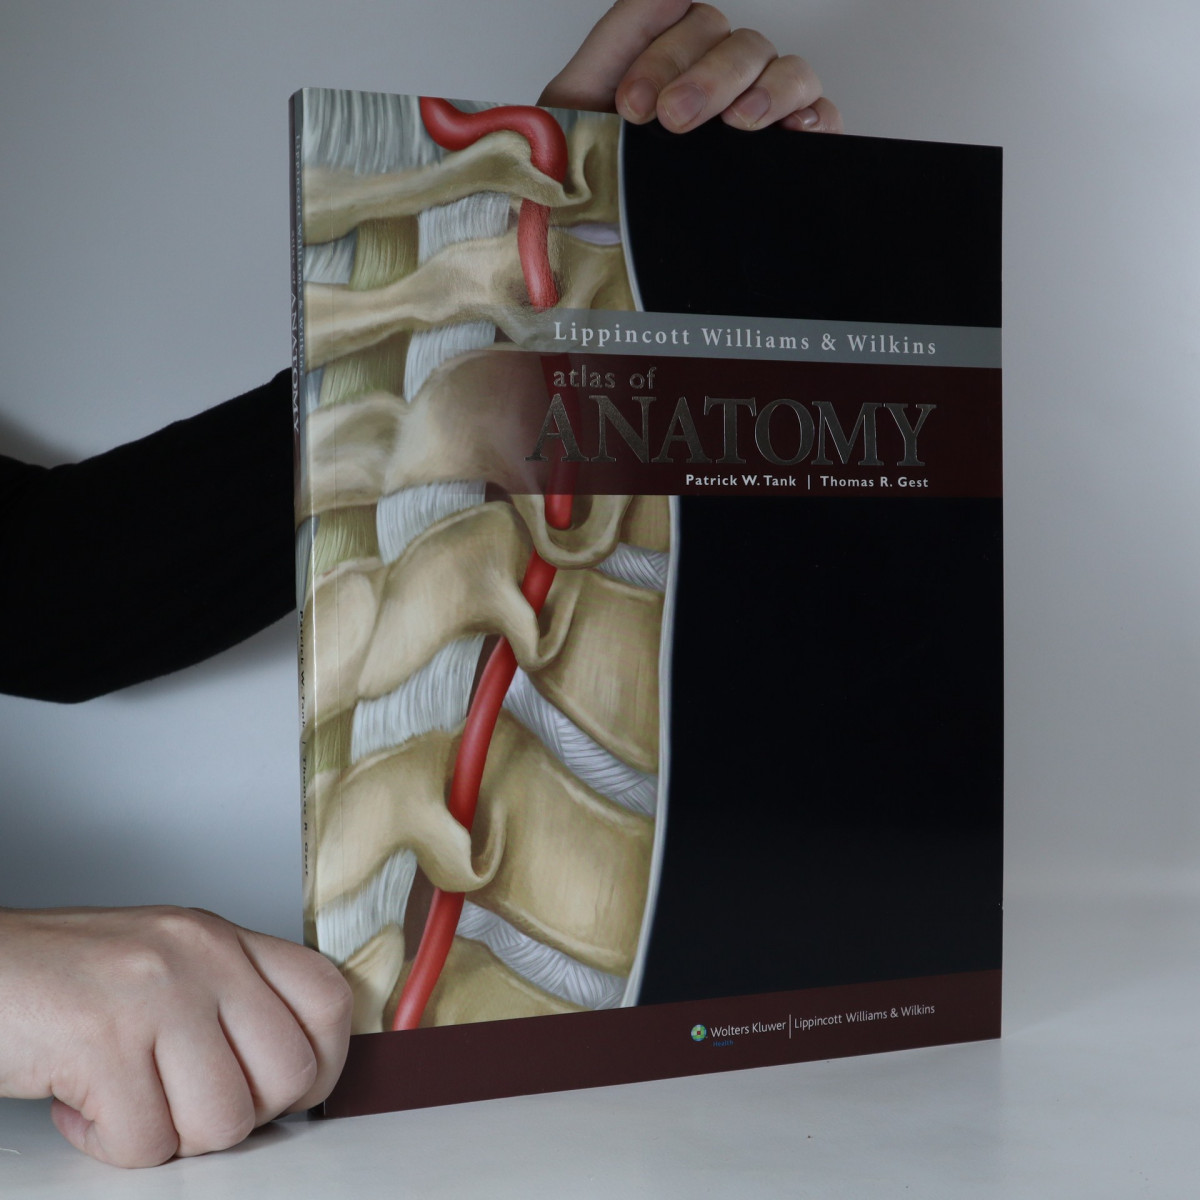 antikvární kniha Lippincott Williams & Wilkins Atlas of Anatomy, 2009